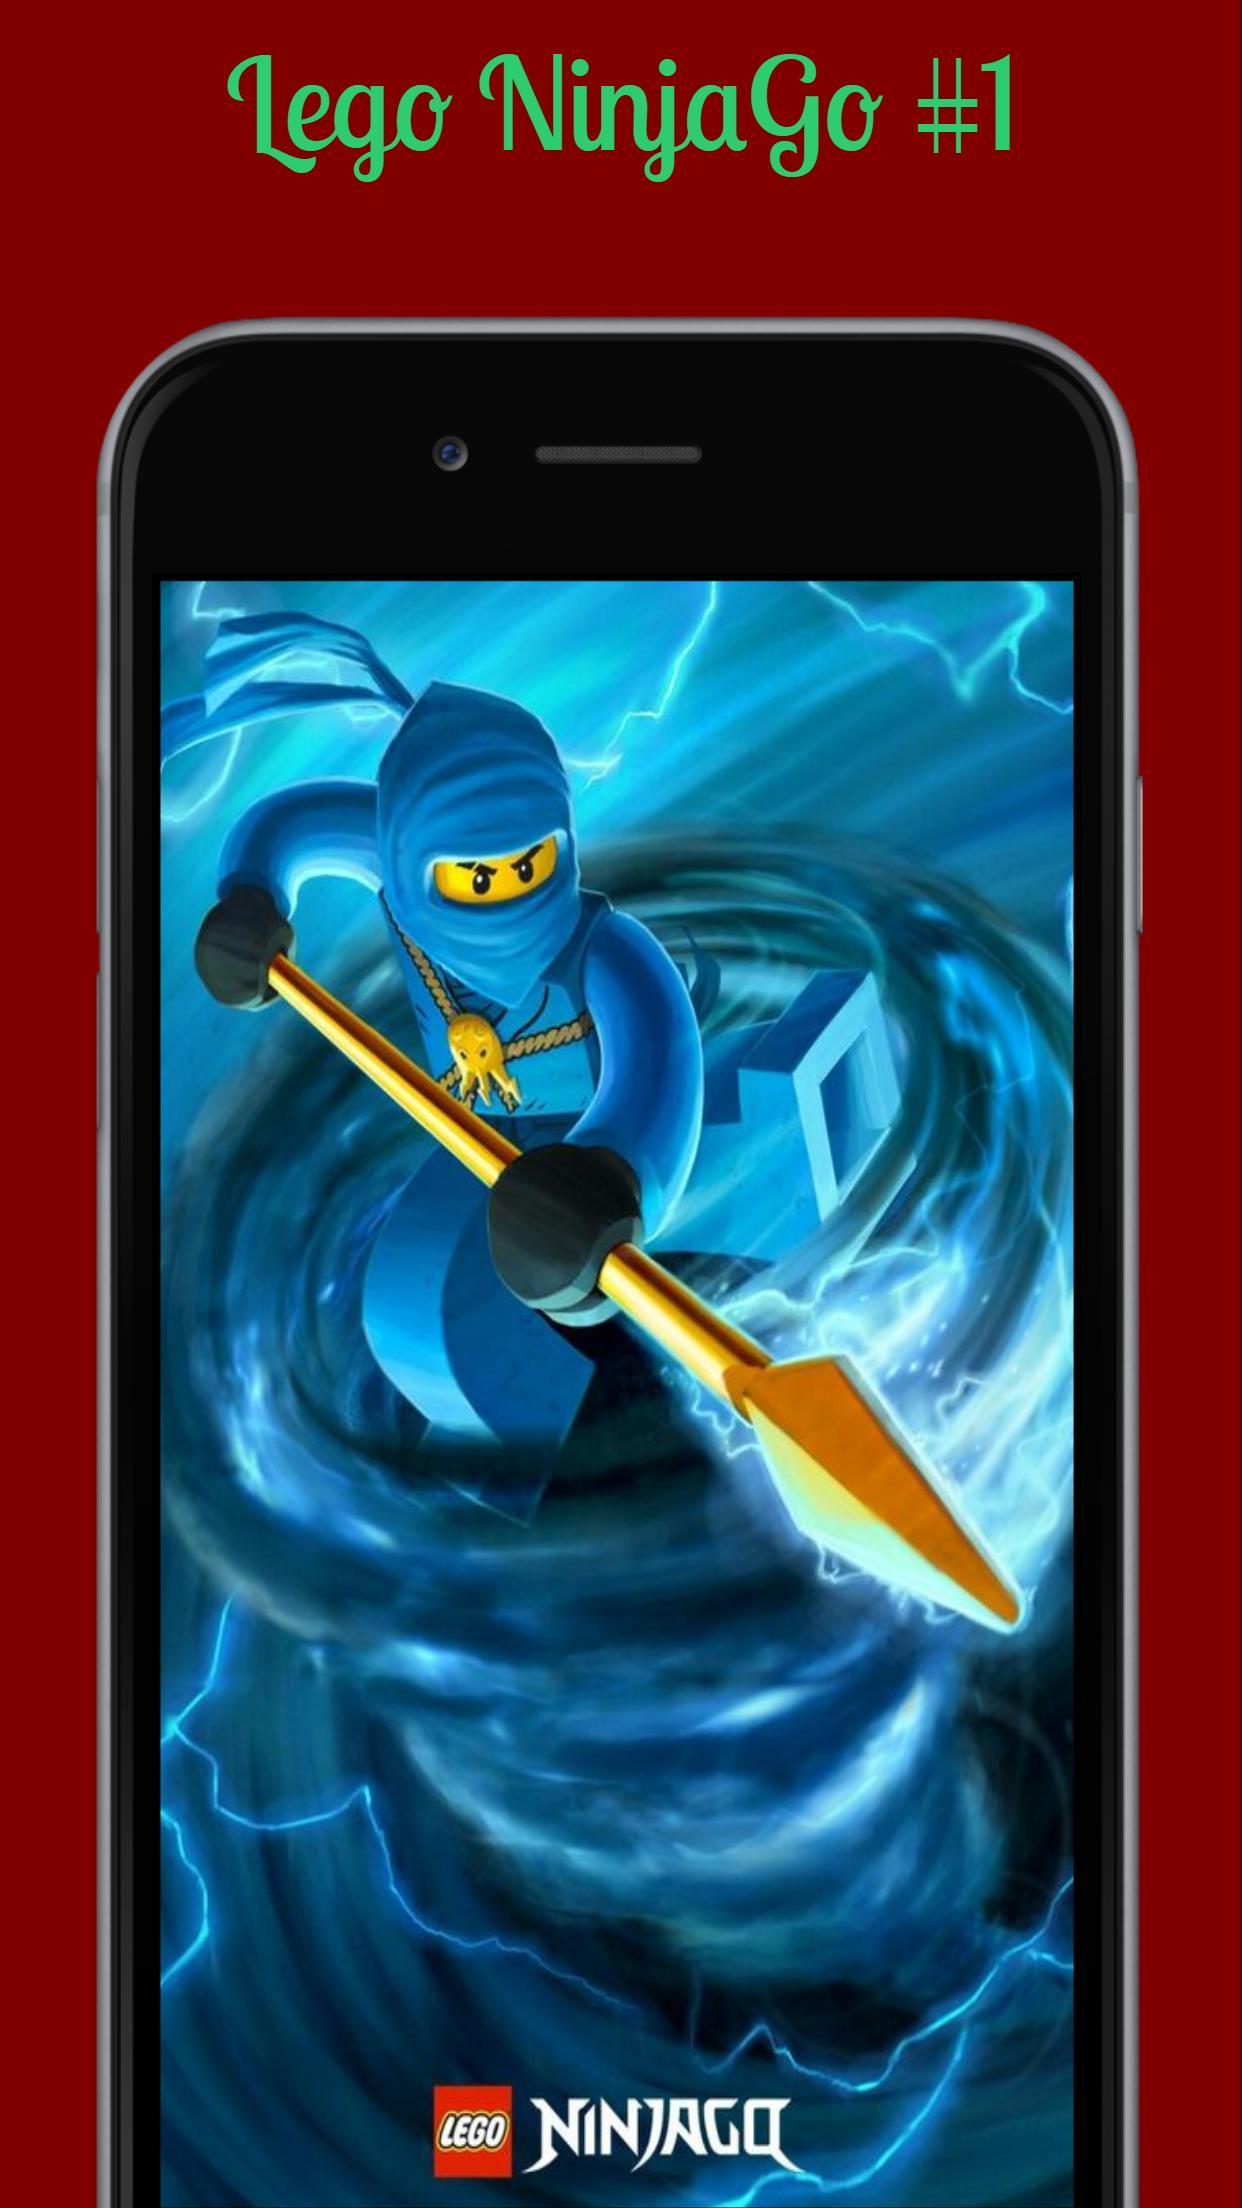 Lego Ninjago Wallpaper Phone Tab For Android Apk Download